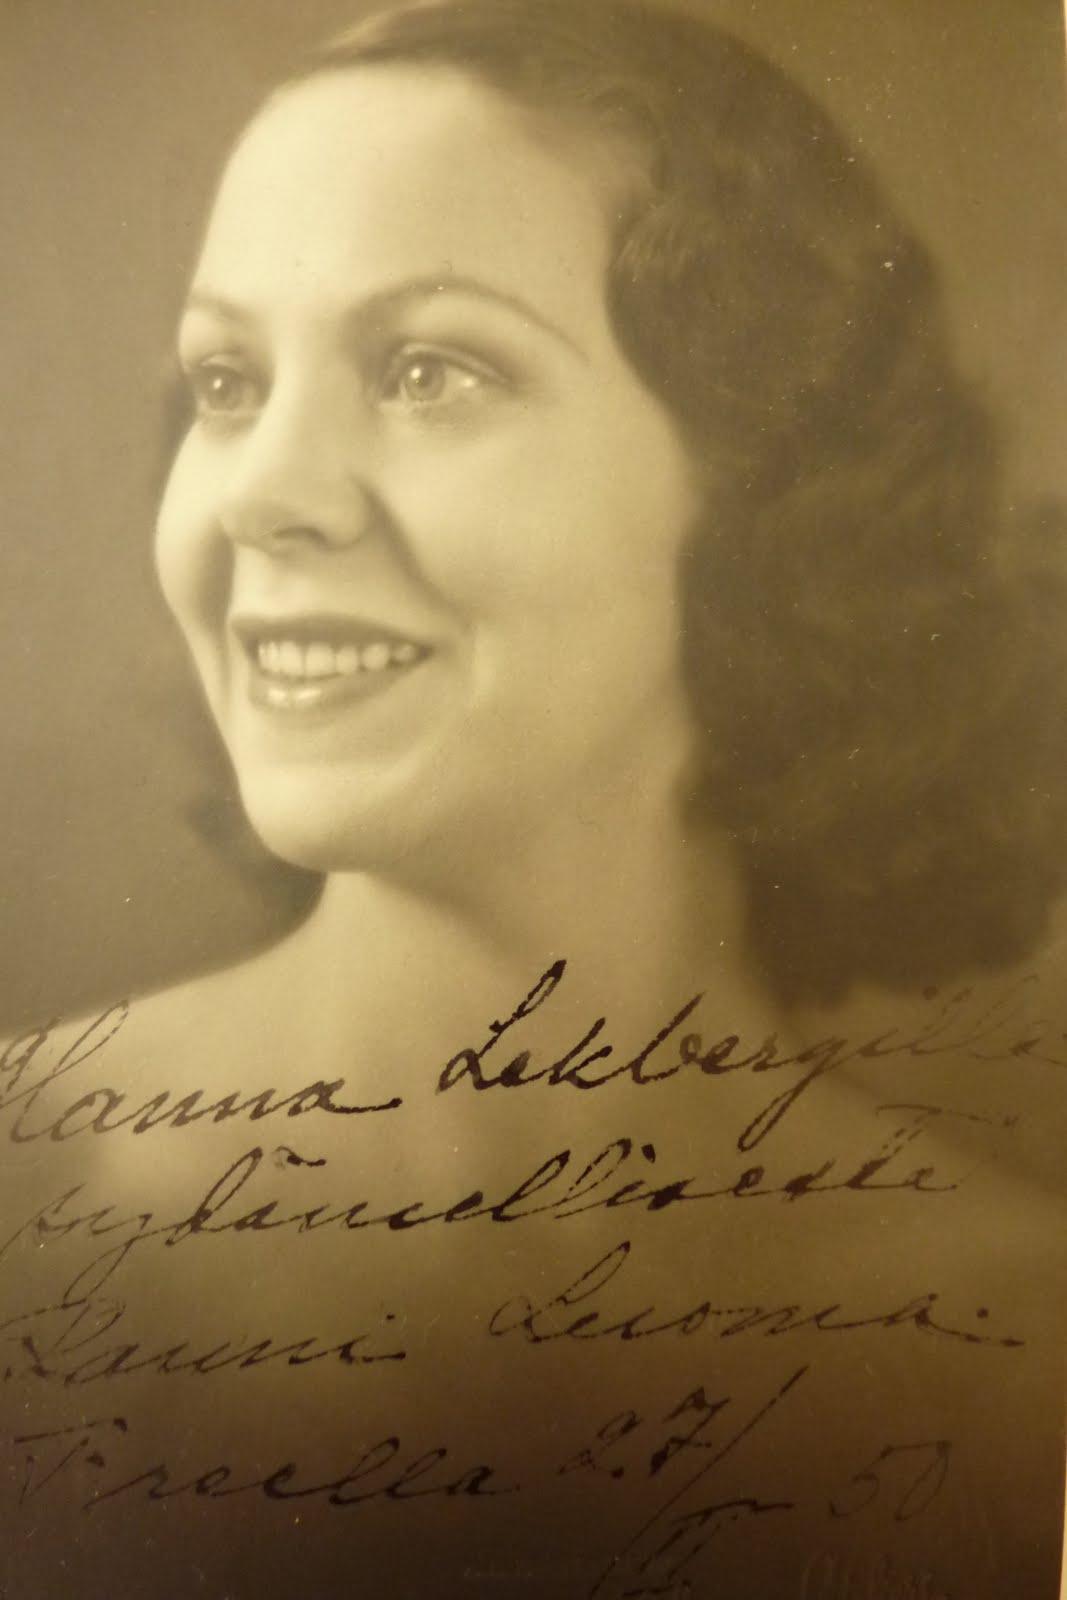 Elna Hellman